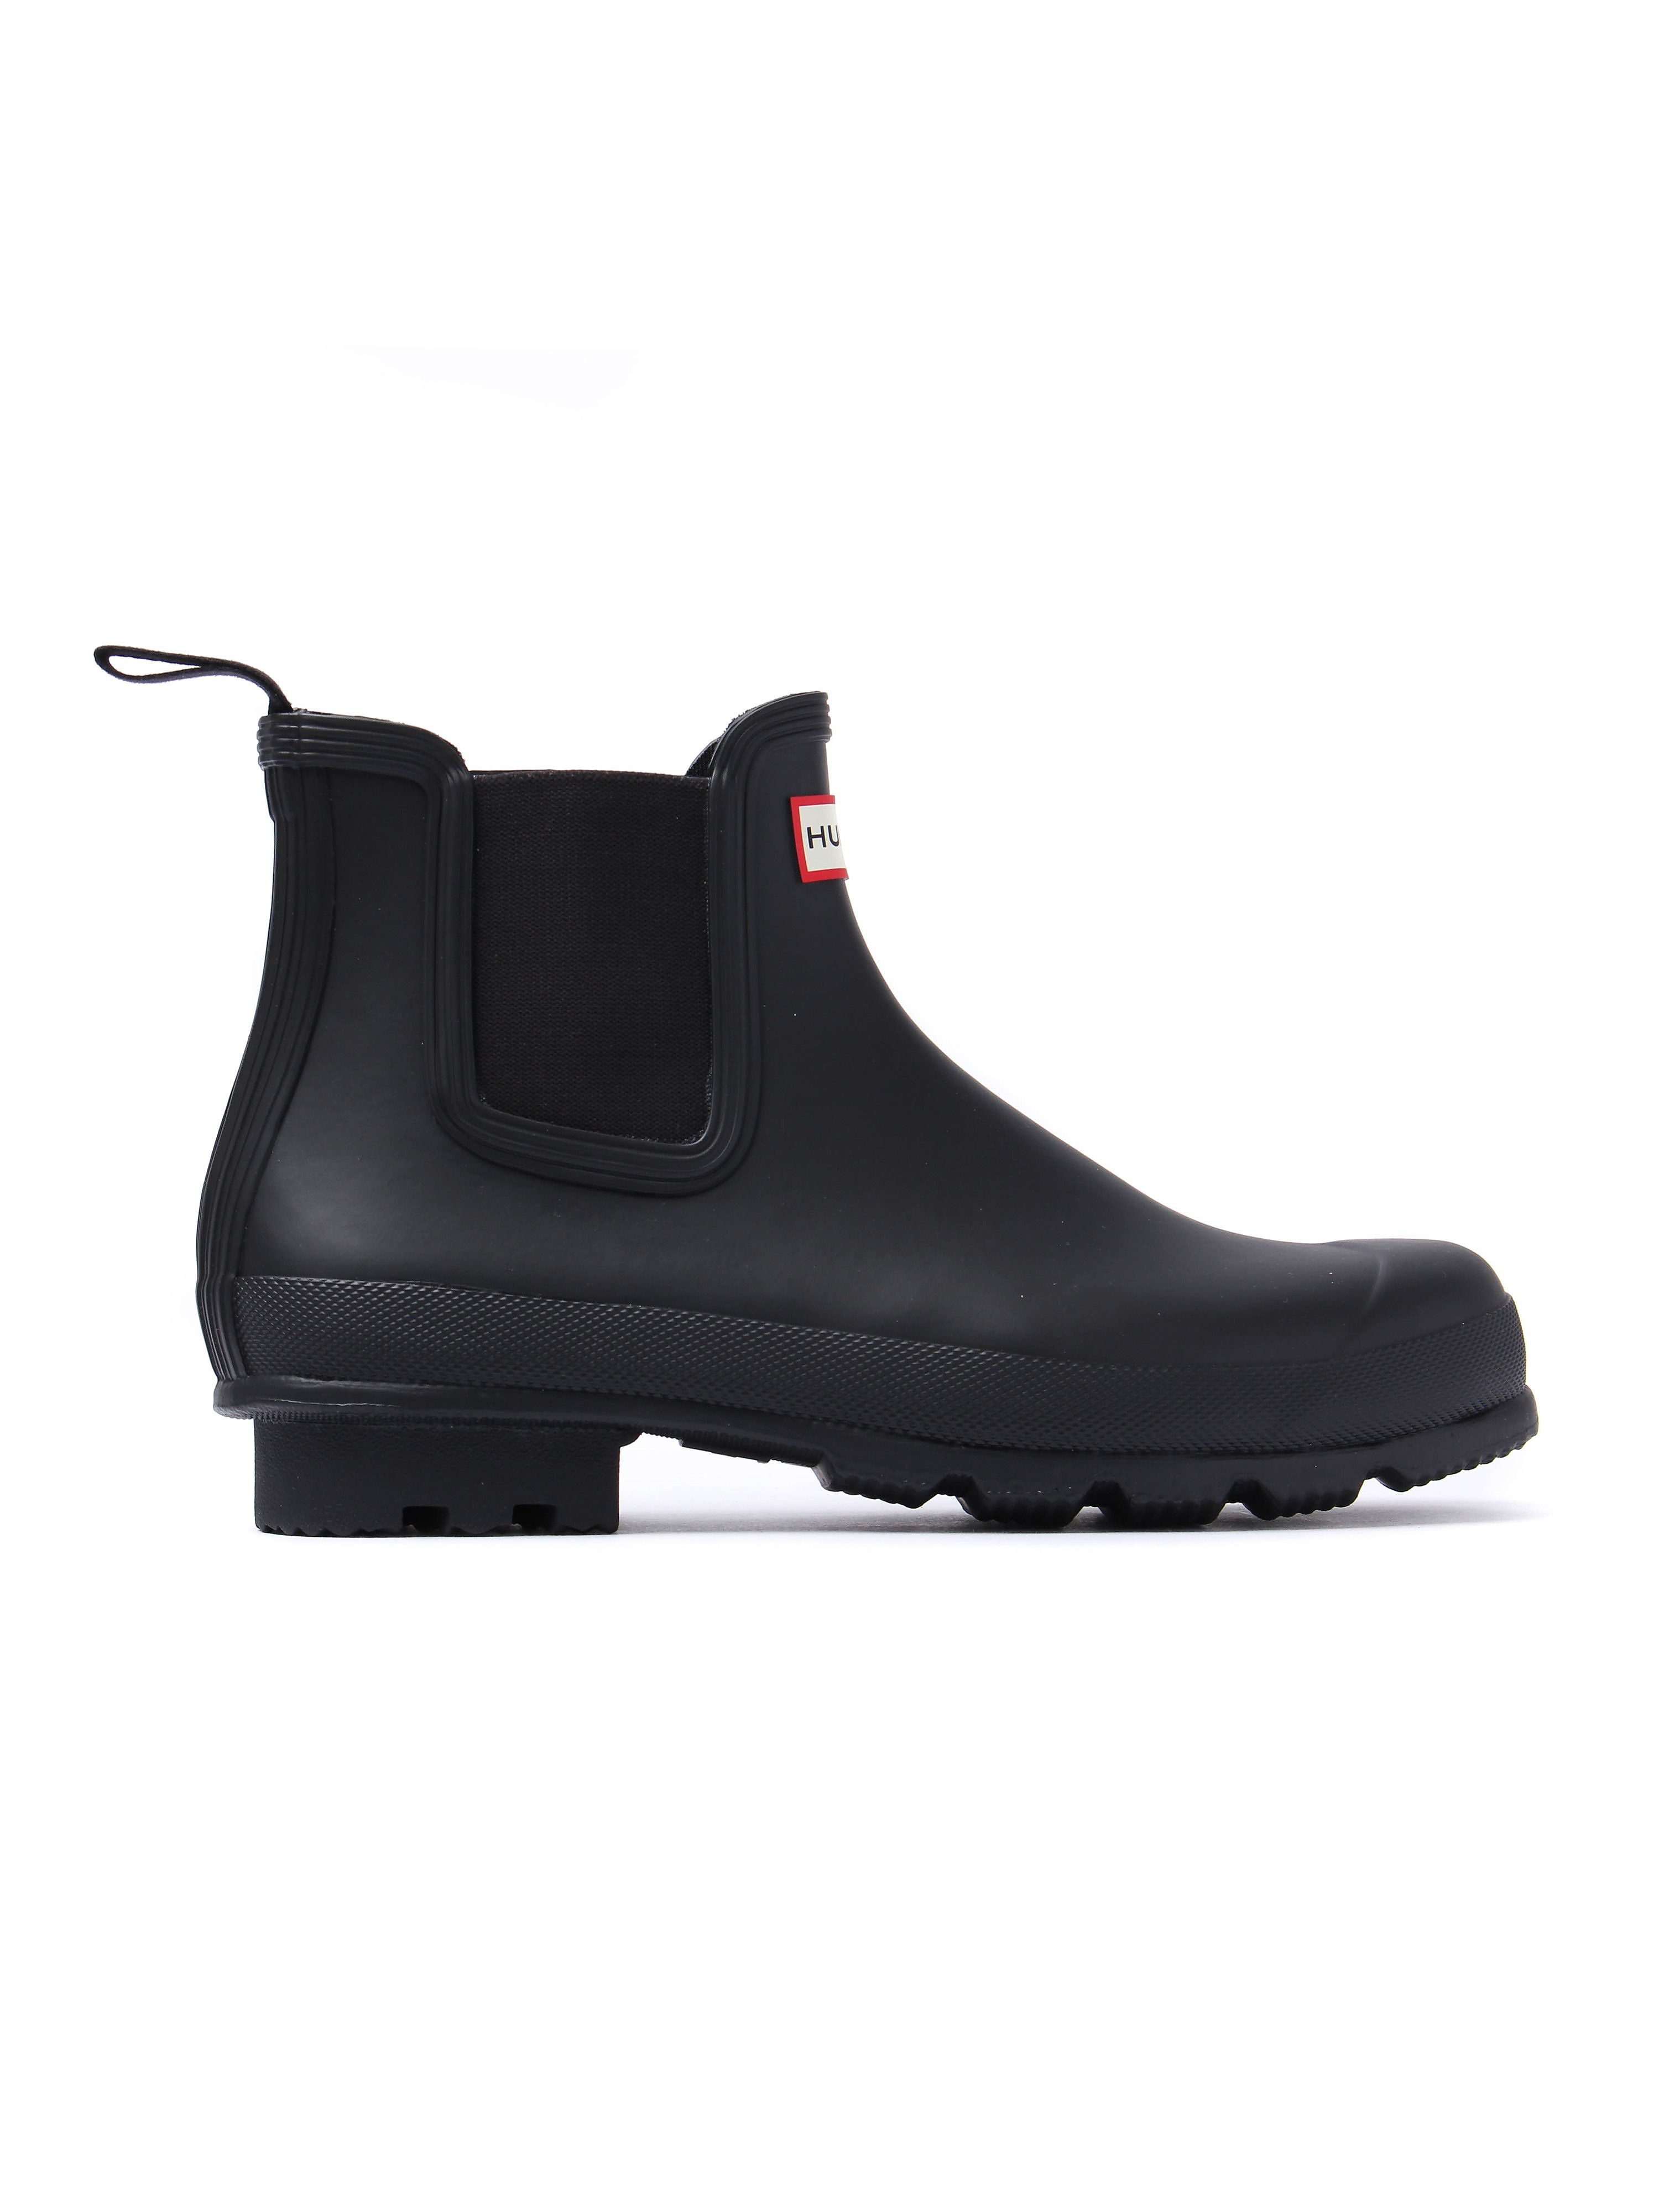 Hunter Wellies Original Dark Sole Chelsea Boots - Black